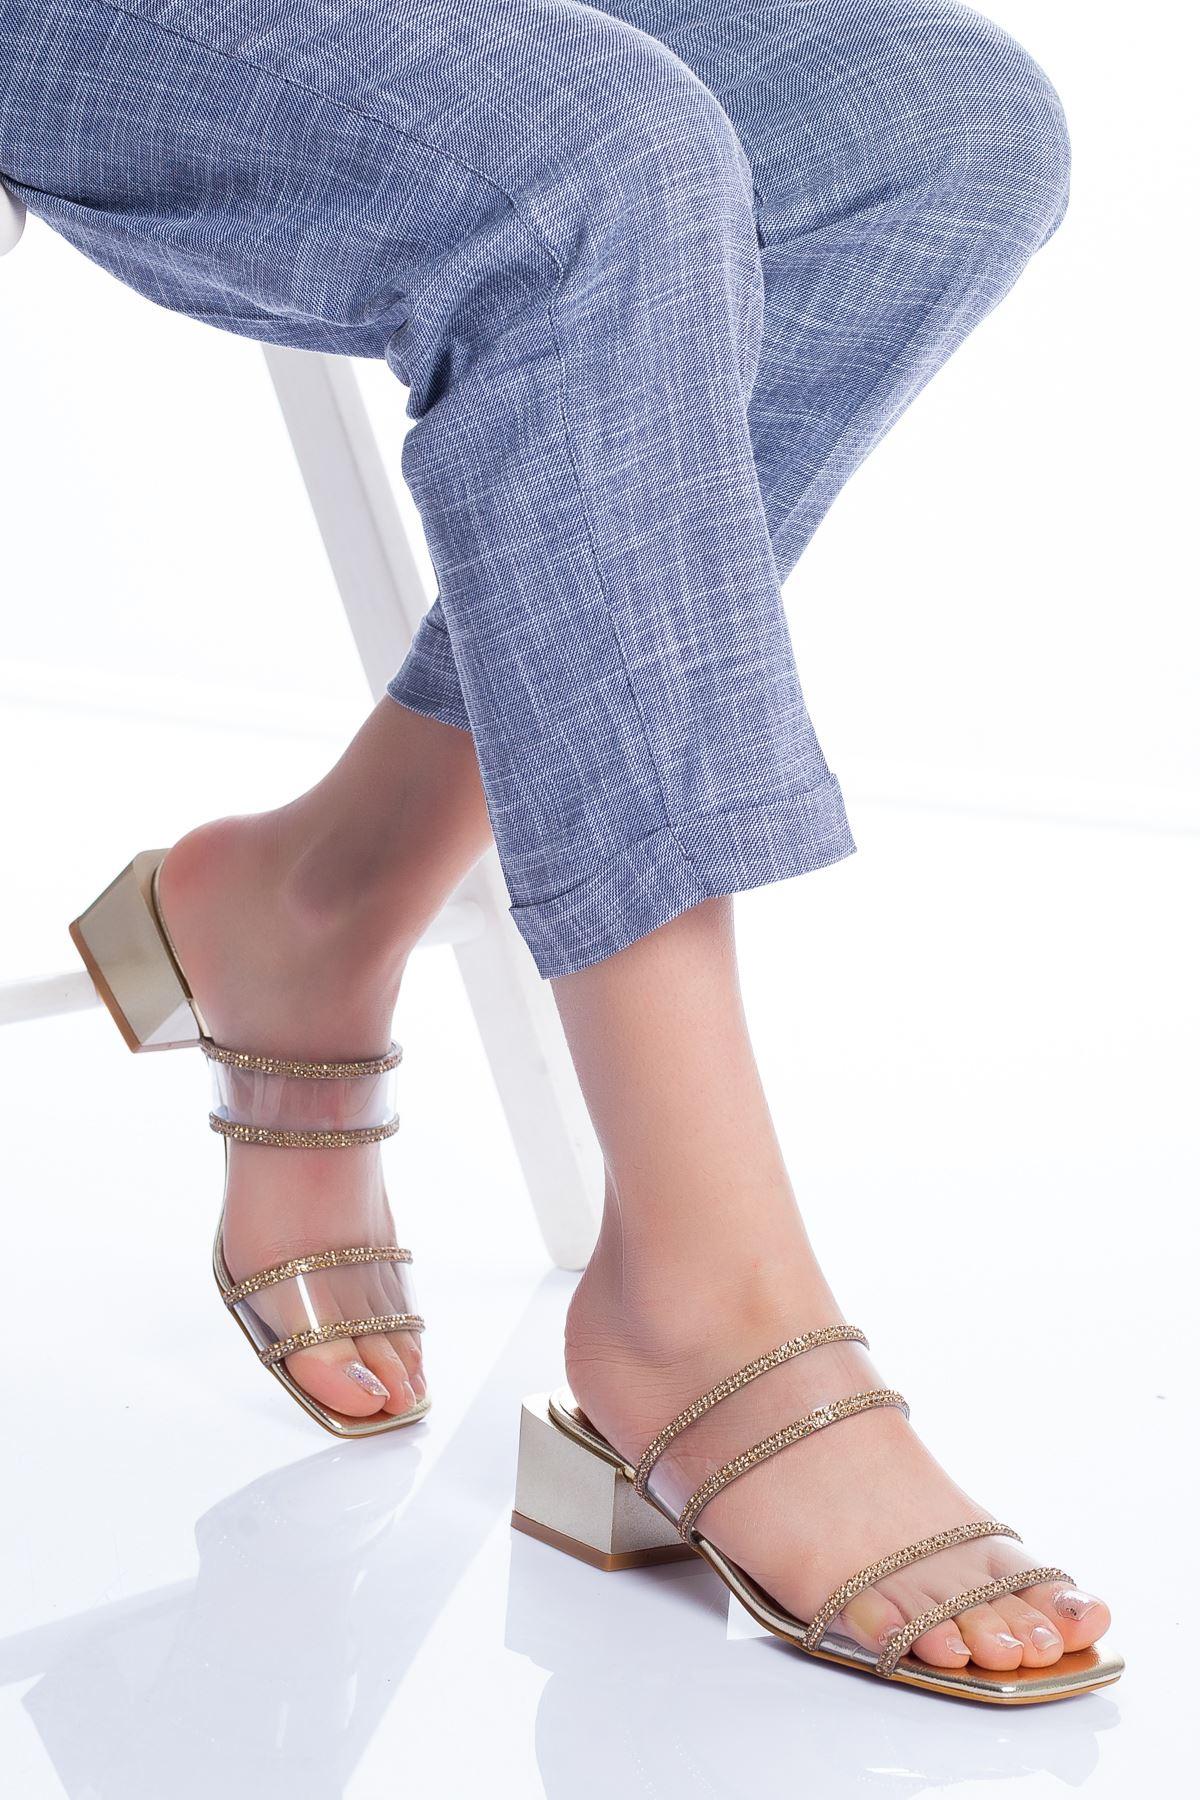 Lodi Topuklu Ayakkabı GOLD